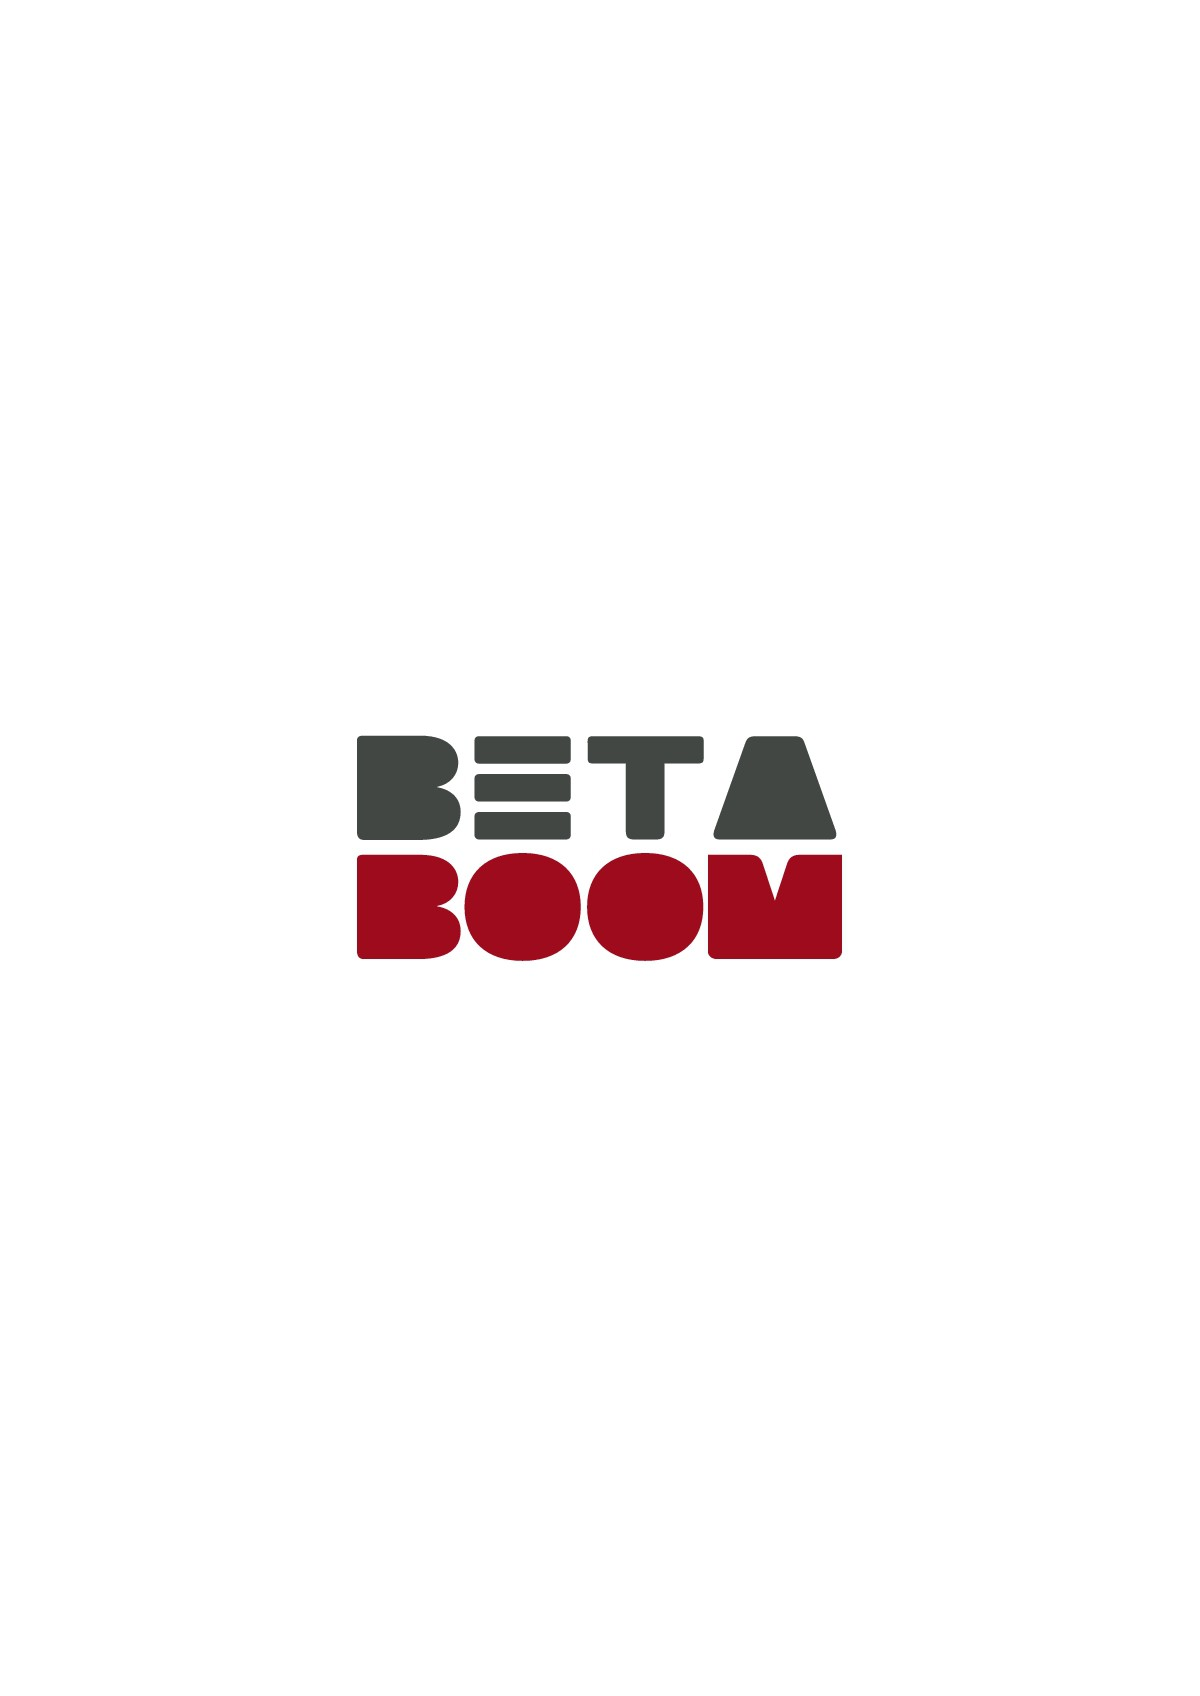 Branding for Beta Boom -- A Startup Accelerator Program